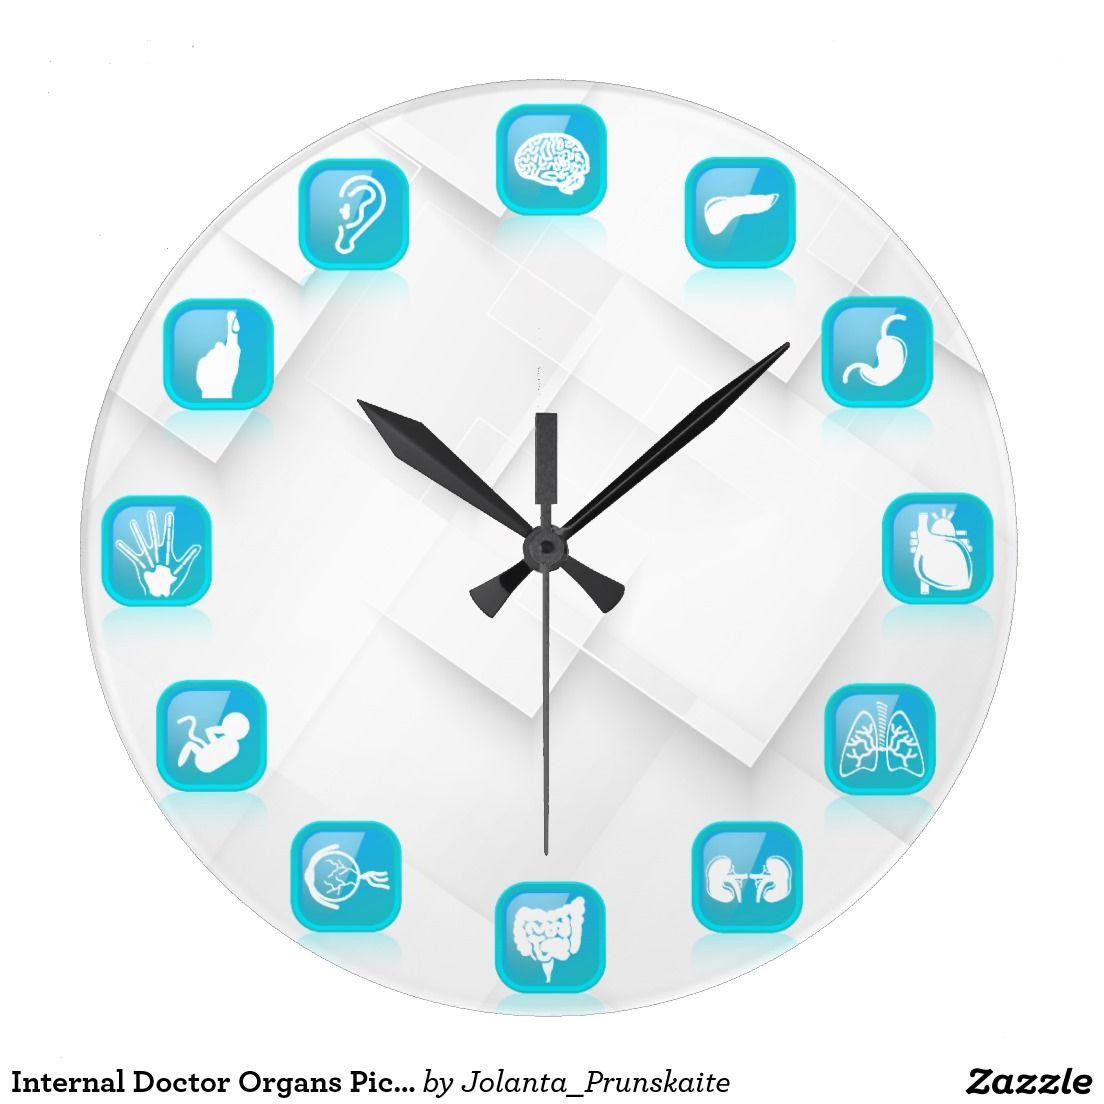 Internal doctor organs picture original wall clock wall clocks internal doctor organs picture original wall clock amipublicfo Gallery